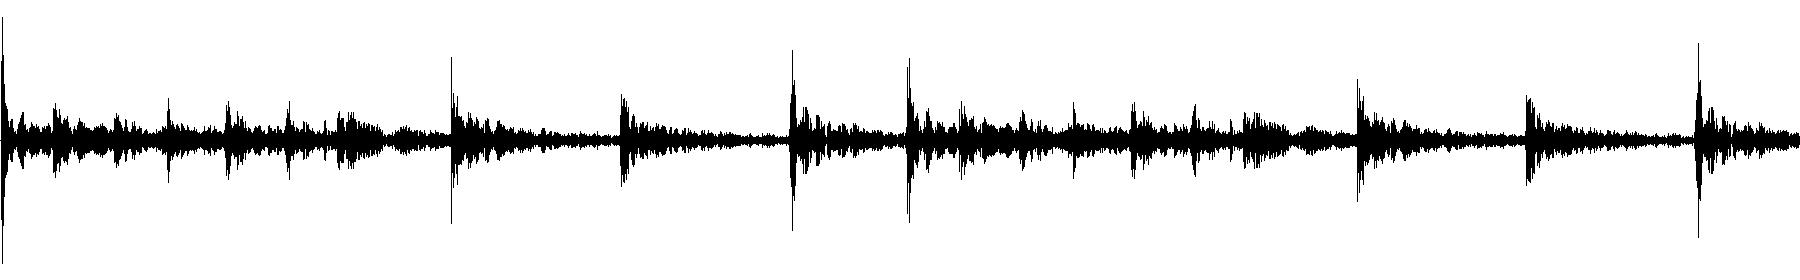 blbc cinedrumsb 95 03